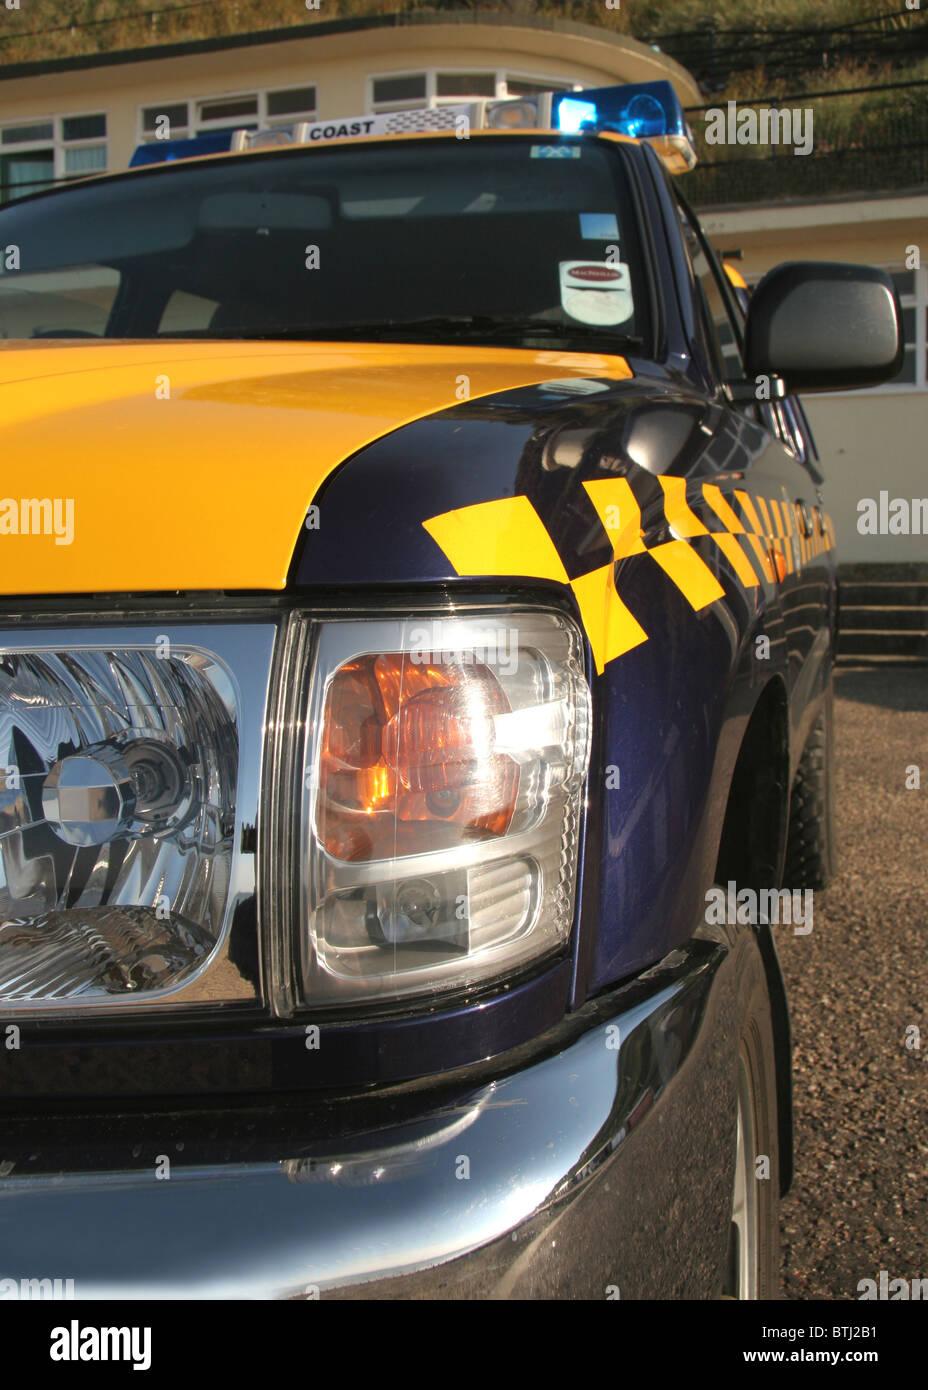 H.M Coastguard Coastguard Rescue Vehicle CRV at Cromer. - Stock Image